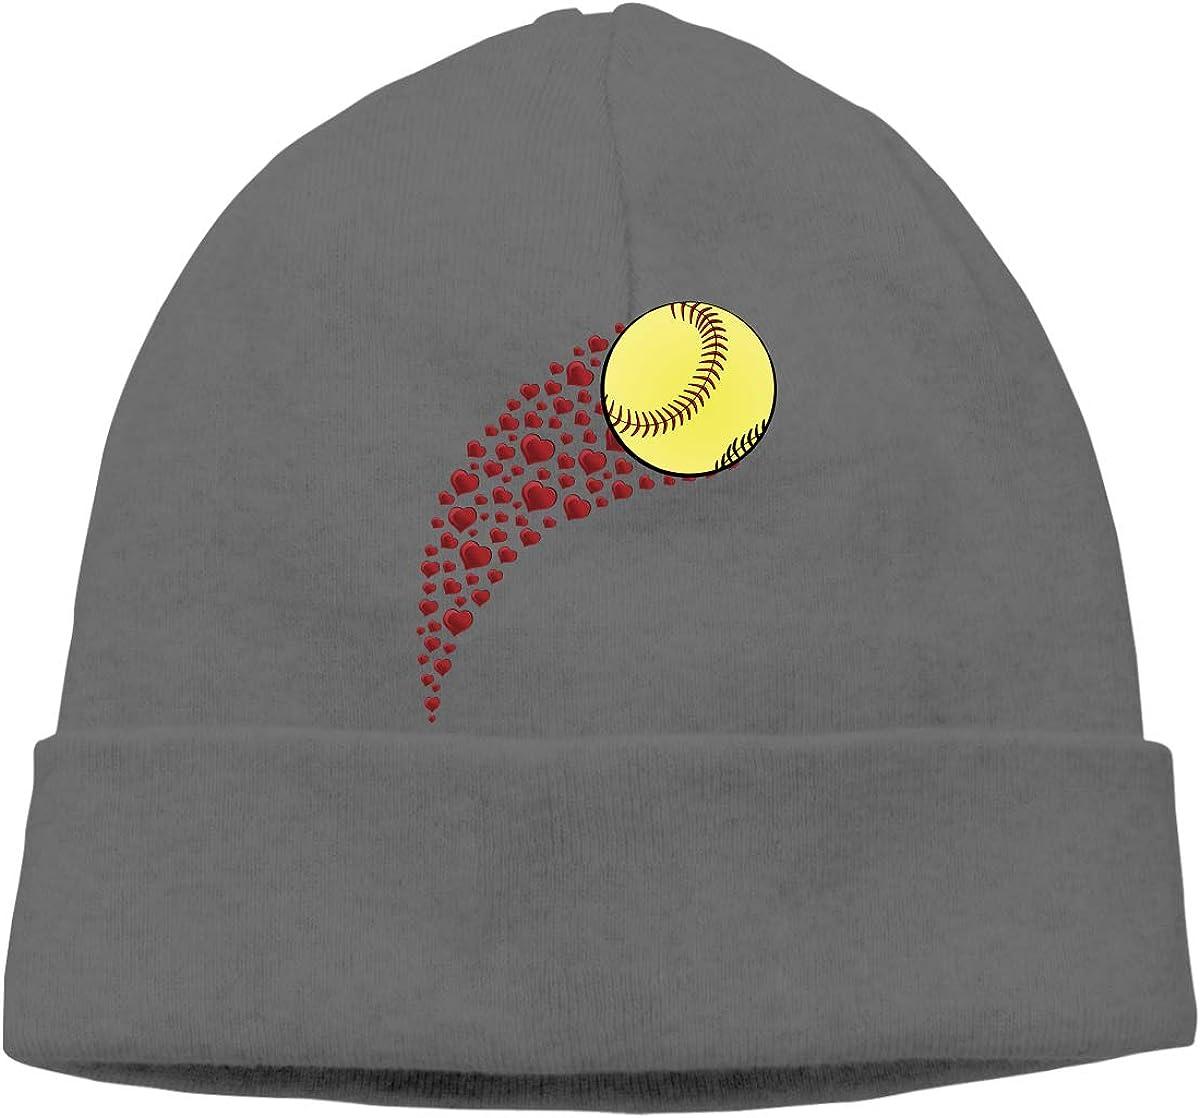 Q10 Men Women Heart Shaped Softball Soft Beanie Hat Soft Hat